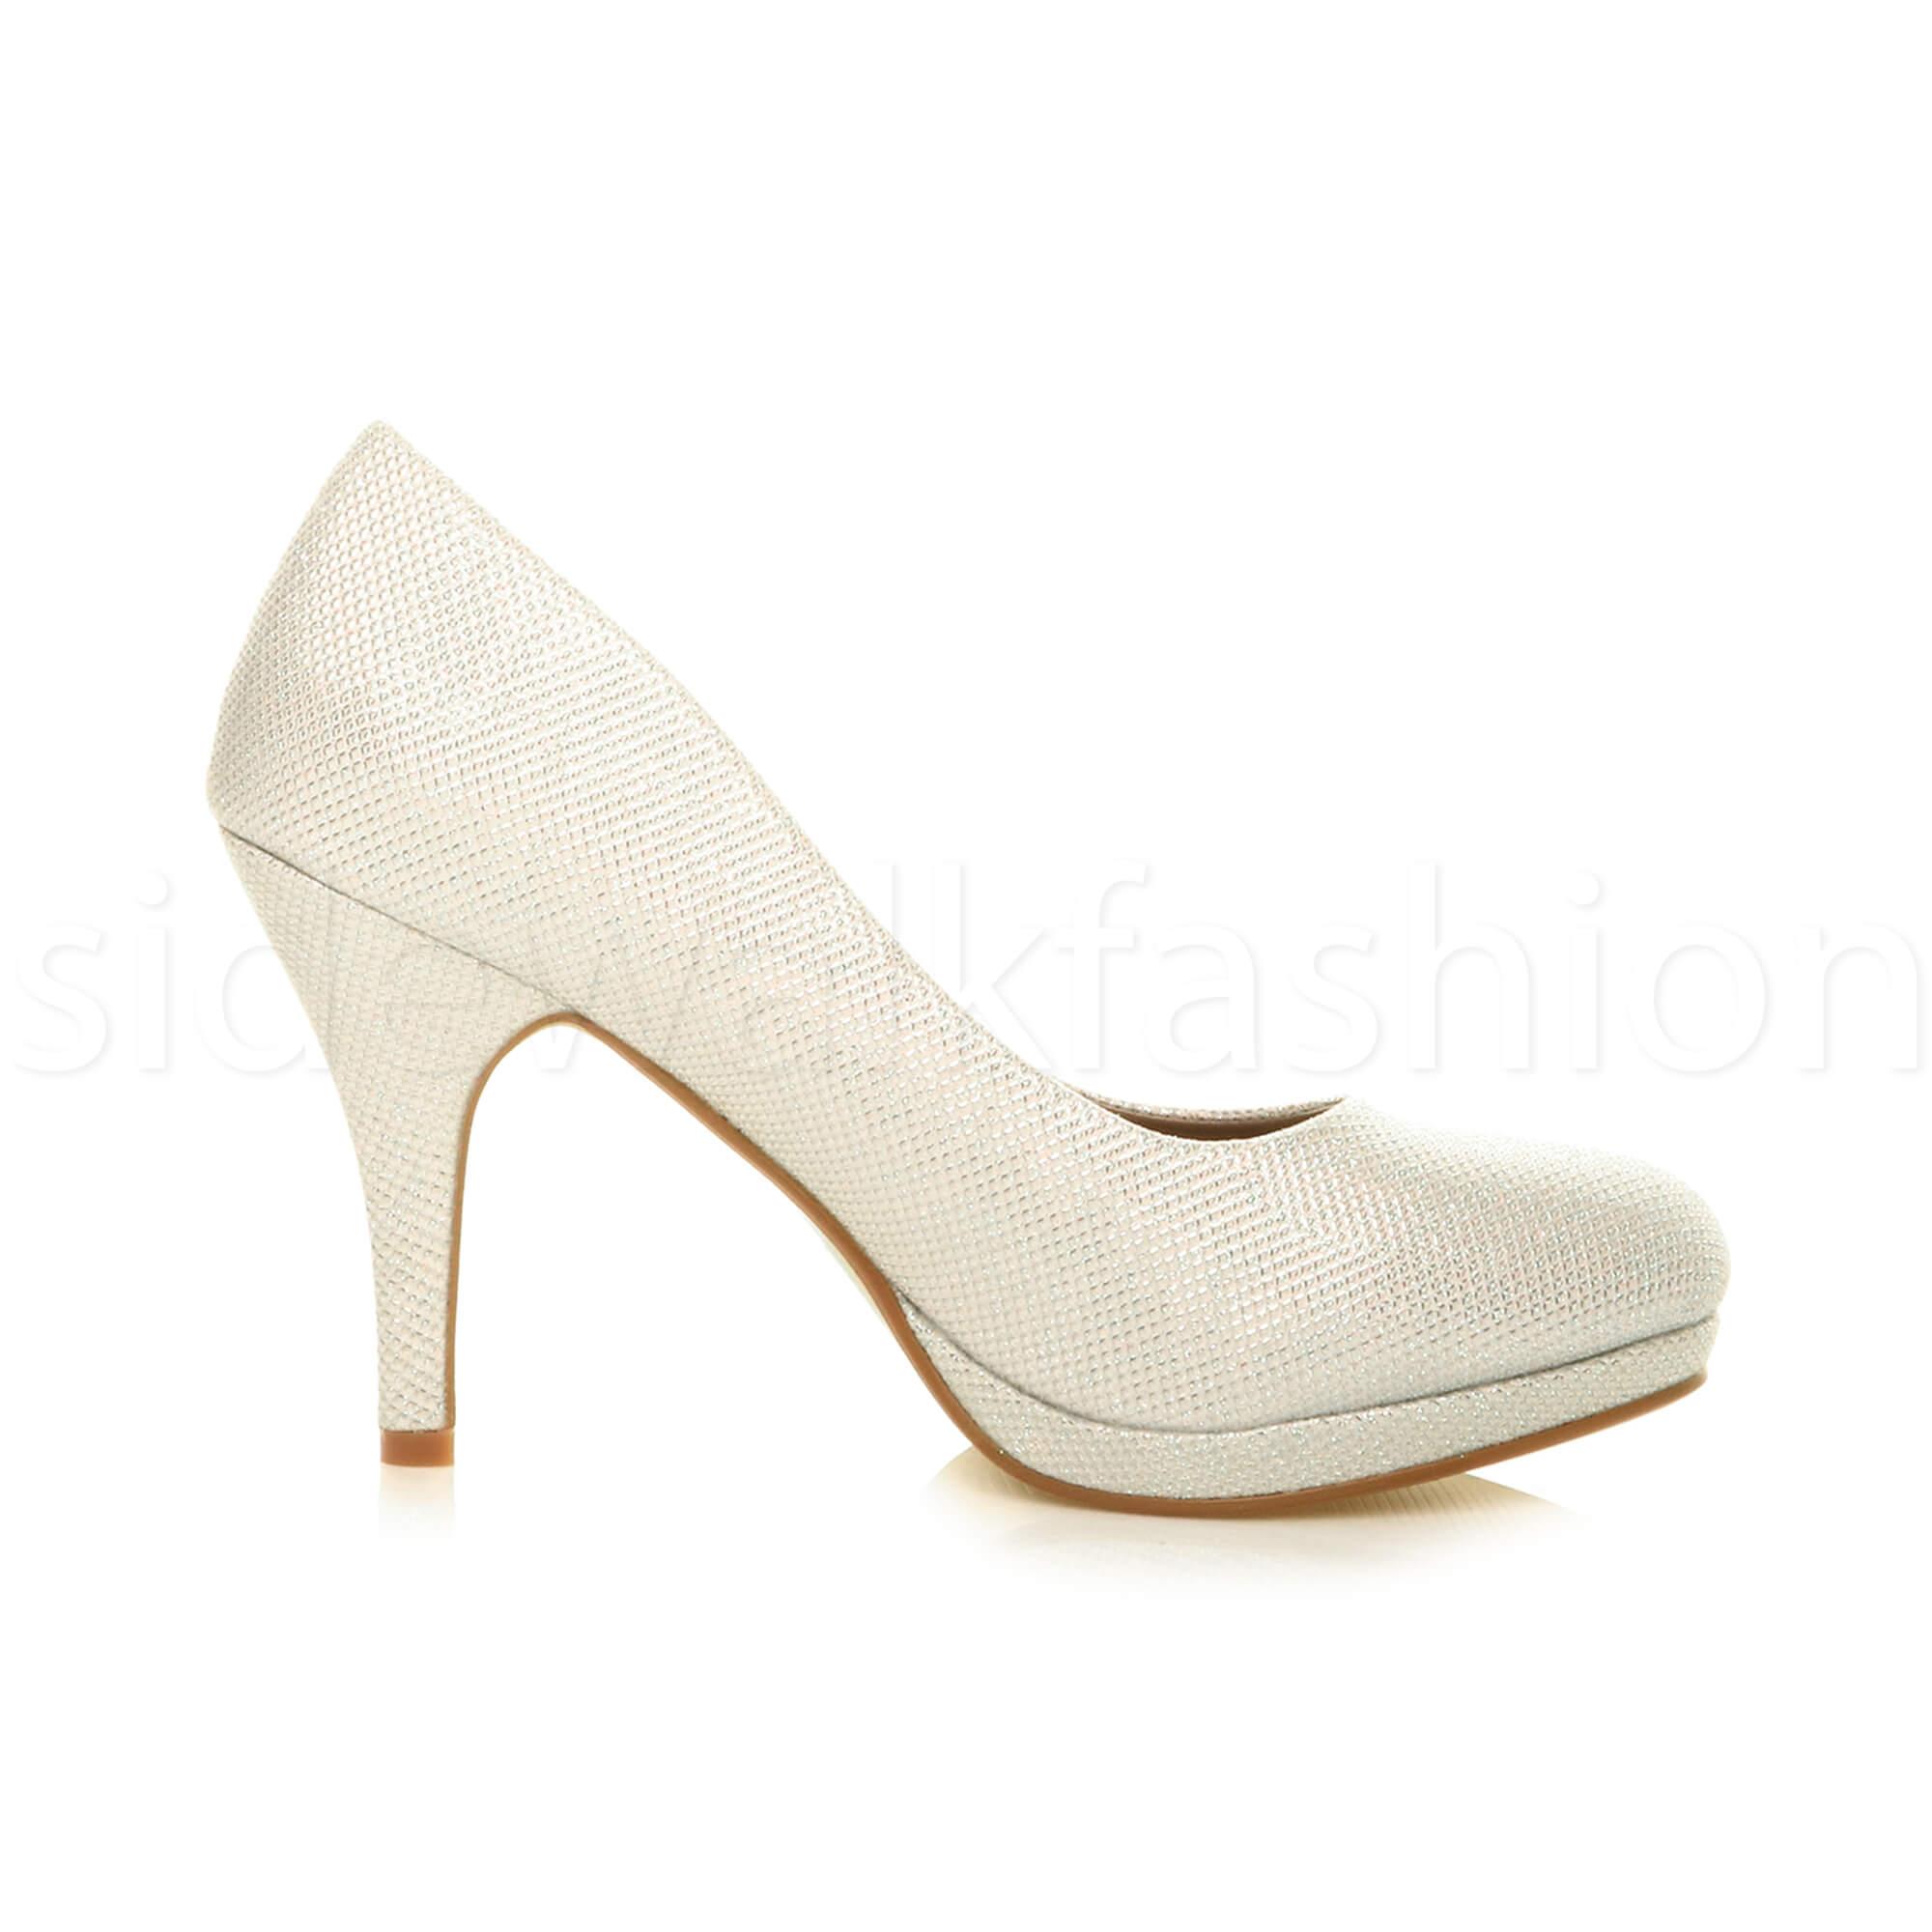 Womens-ladies-high-mid-heel-platform-wedding-evening-bridesmaid-court-shoes-size thumbnail 81